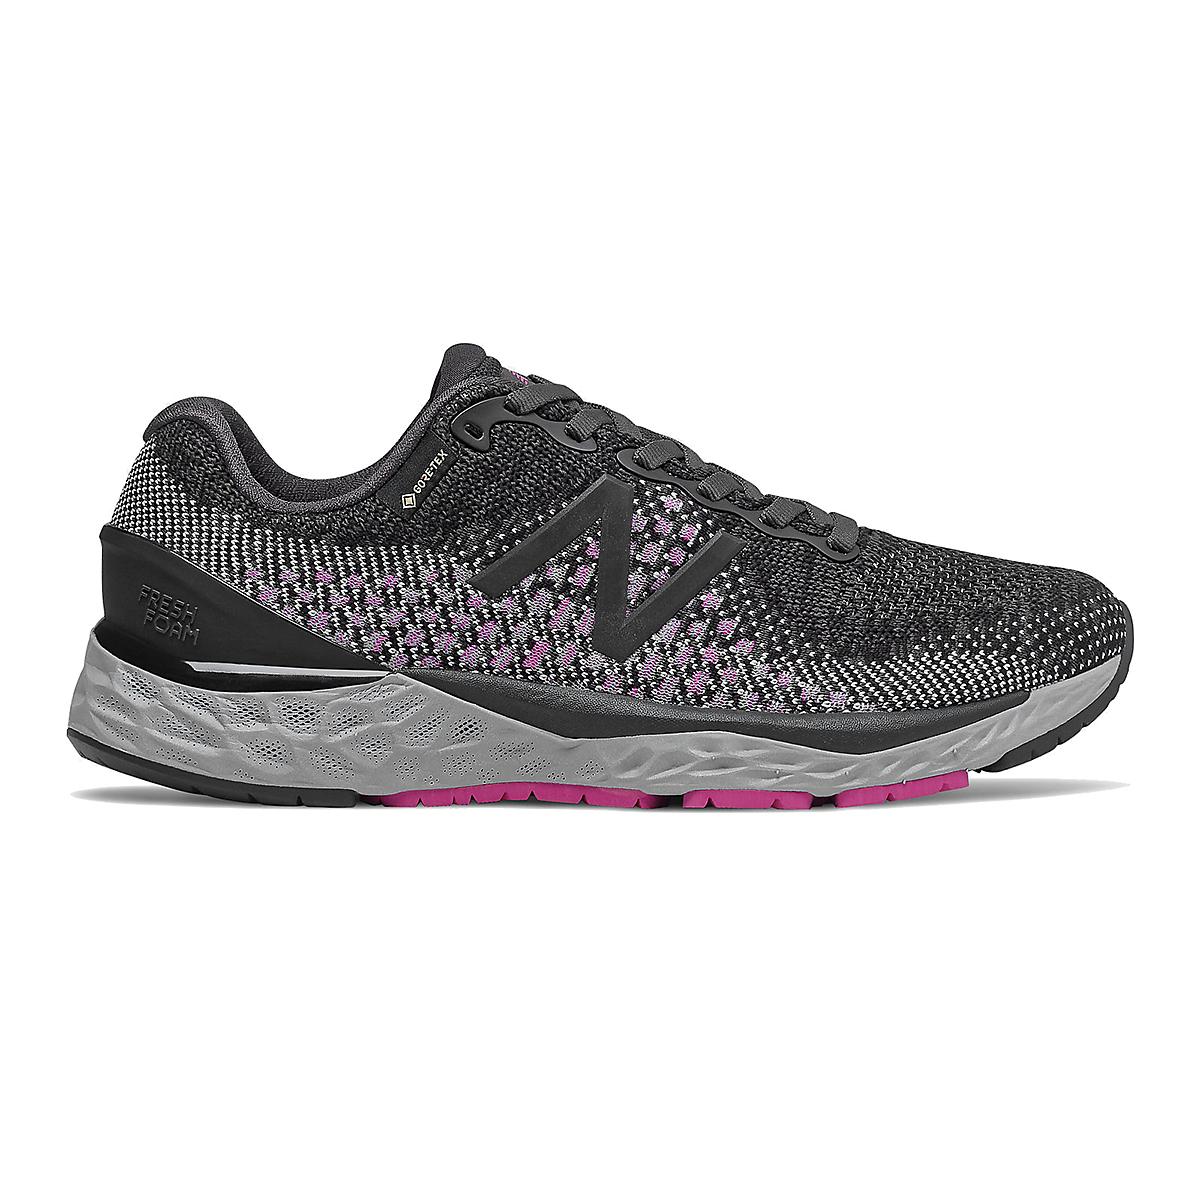 Women's New Balance Fresh Foam 880v10 Gore-Tex Running Shoe - Color: Black With Thunder - Size: 10 - Width: Regular, Black With Thunder, large, image 1